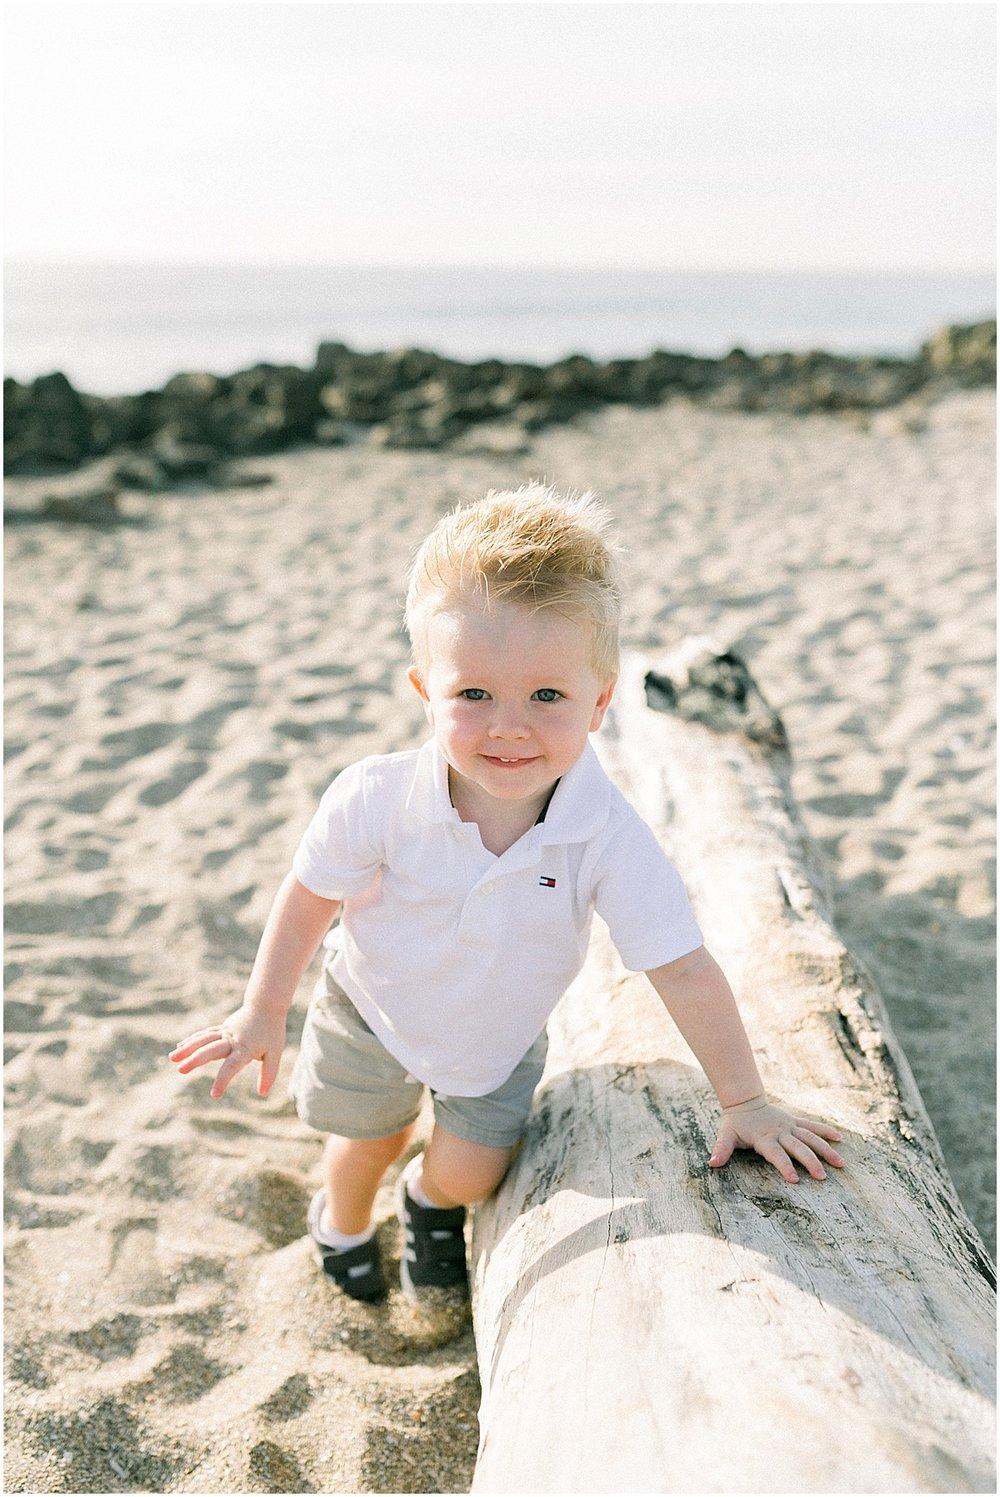 house-of-refuge-little-boy-beach